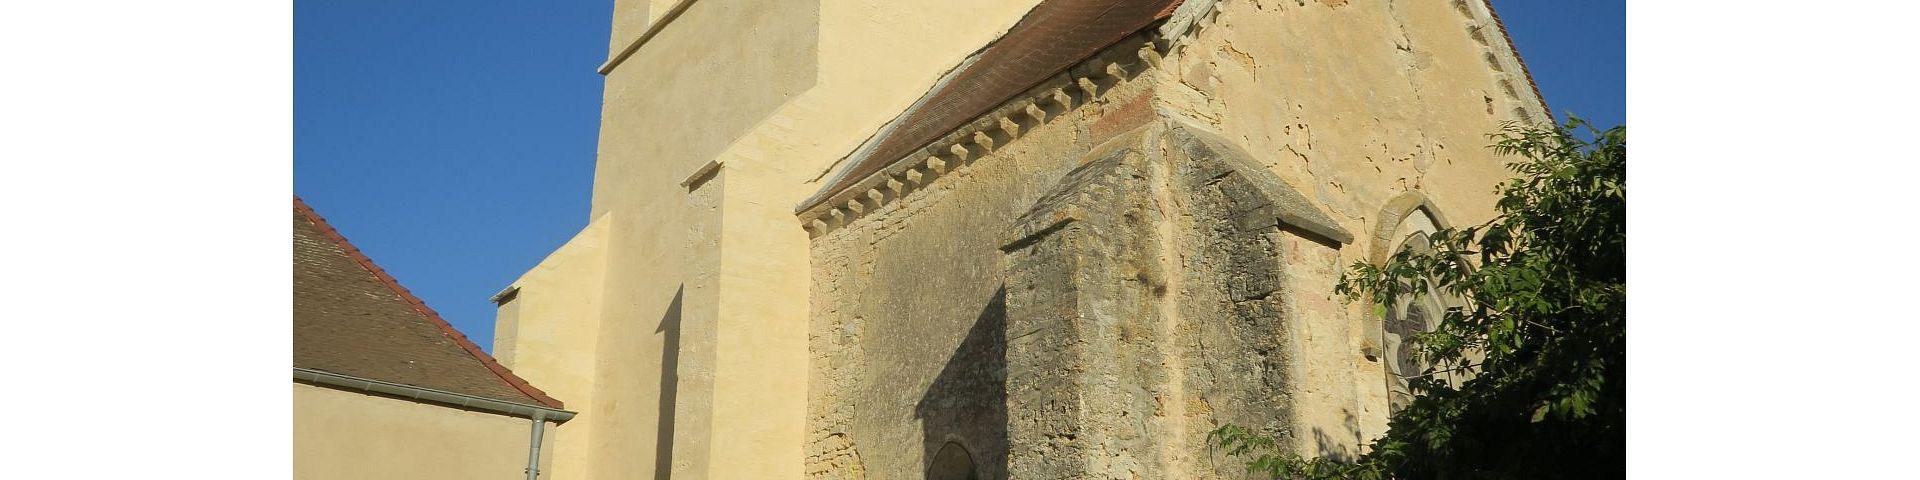 Jancigny - Eglise Saint-Léger (21)